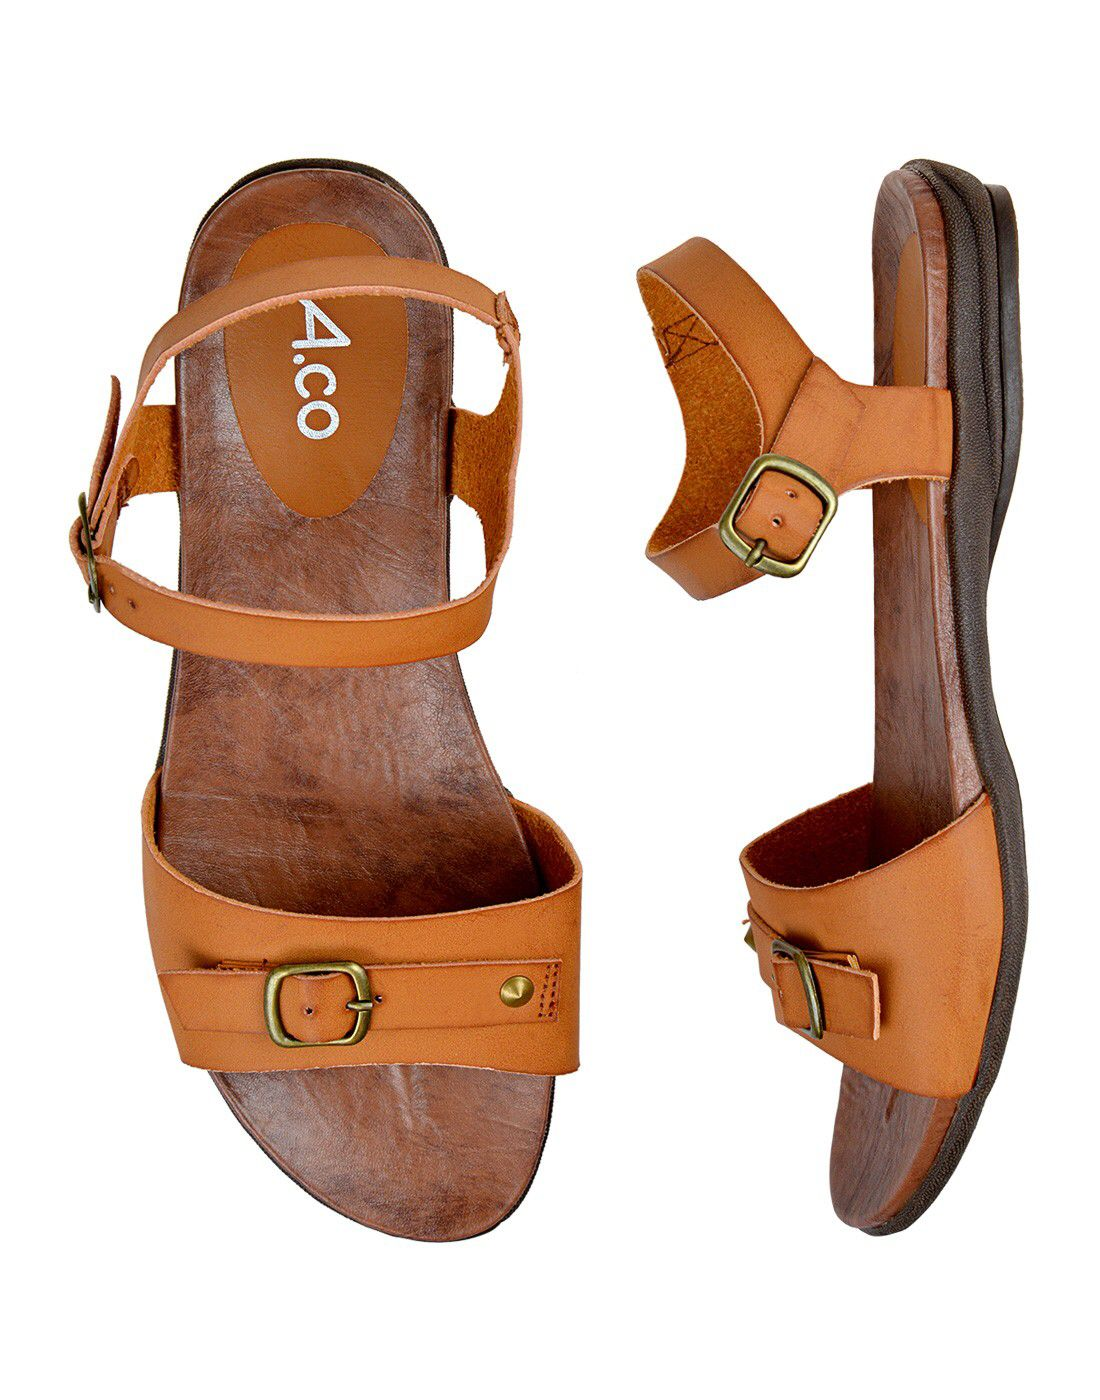 Ardenes sandals!